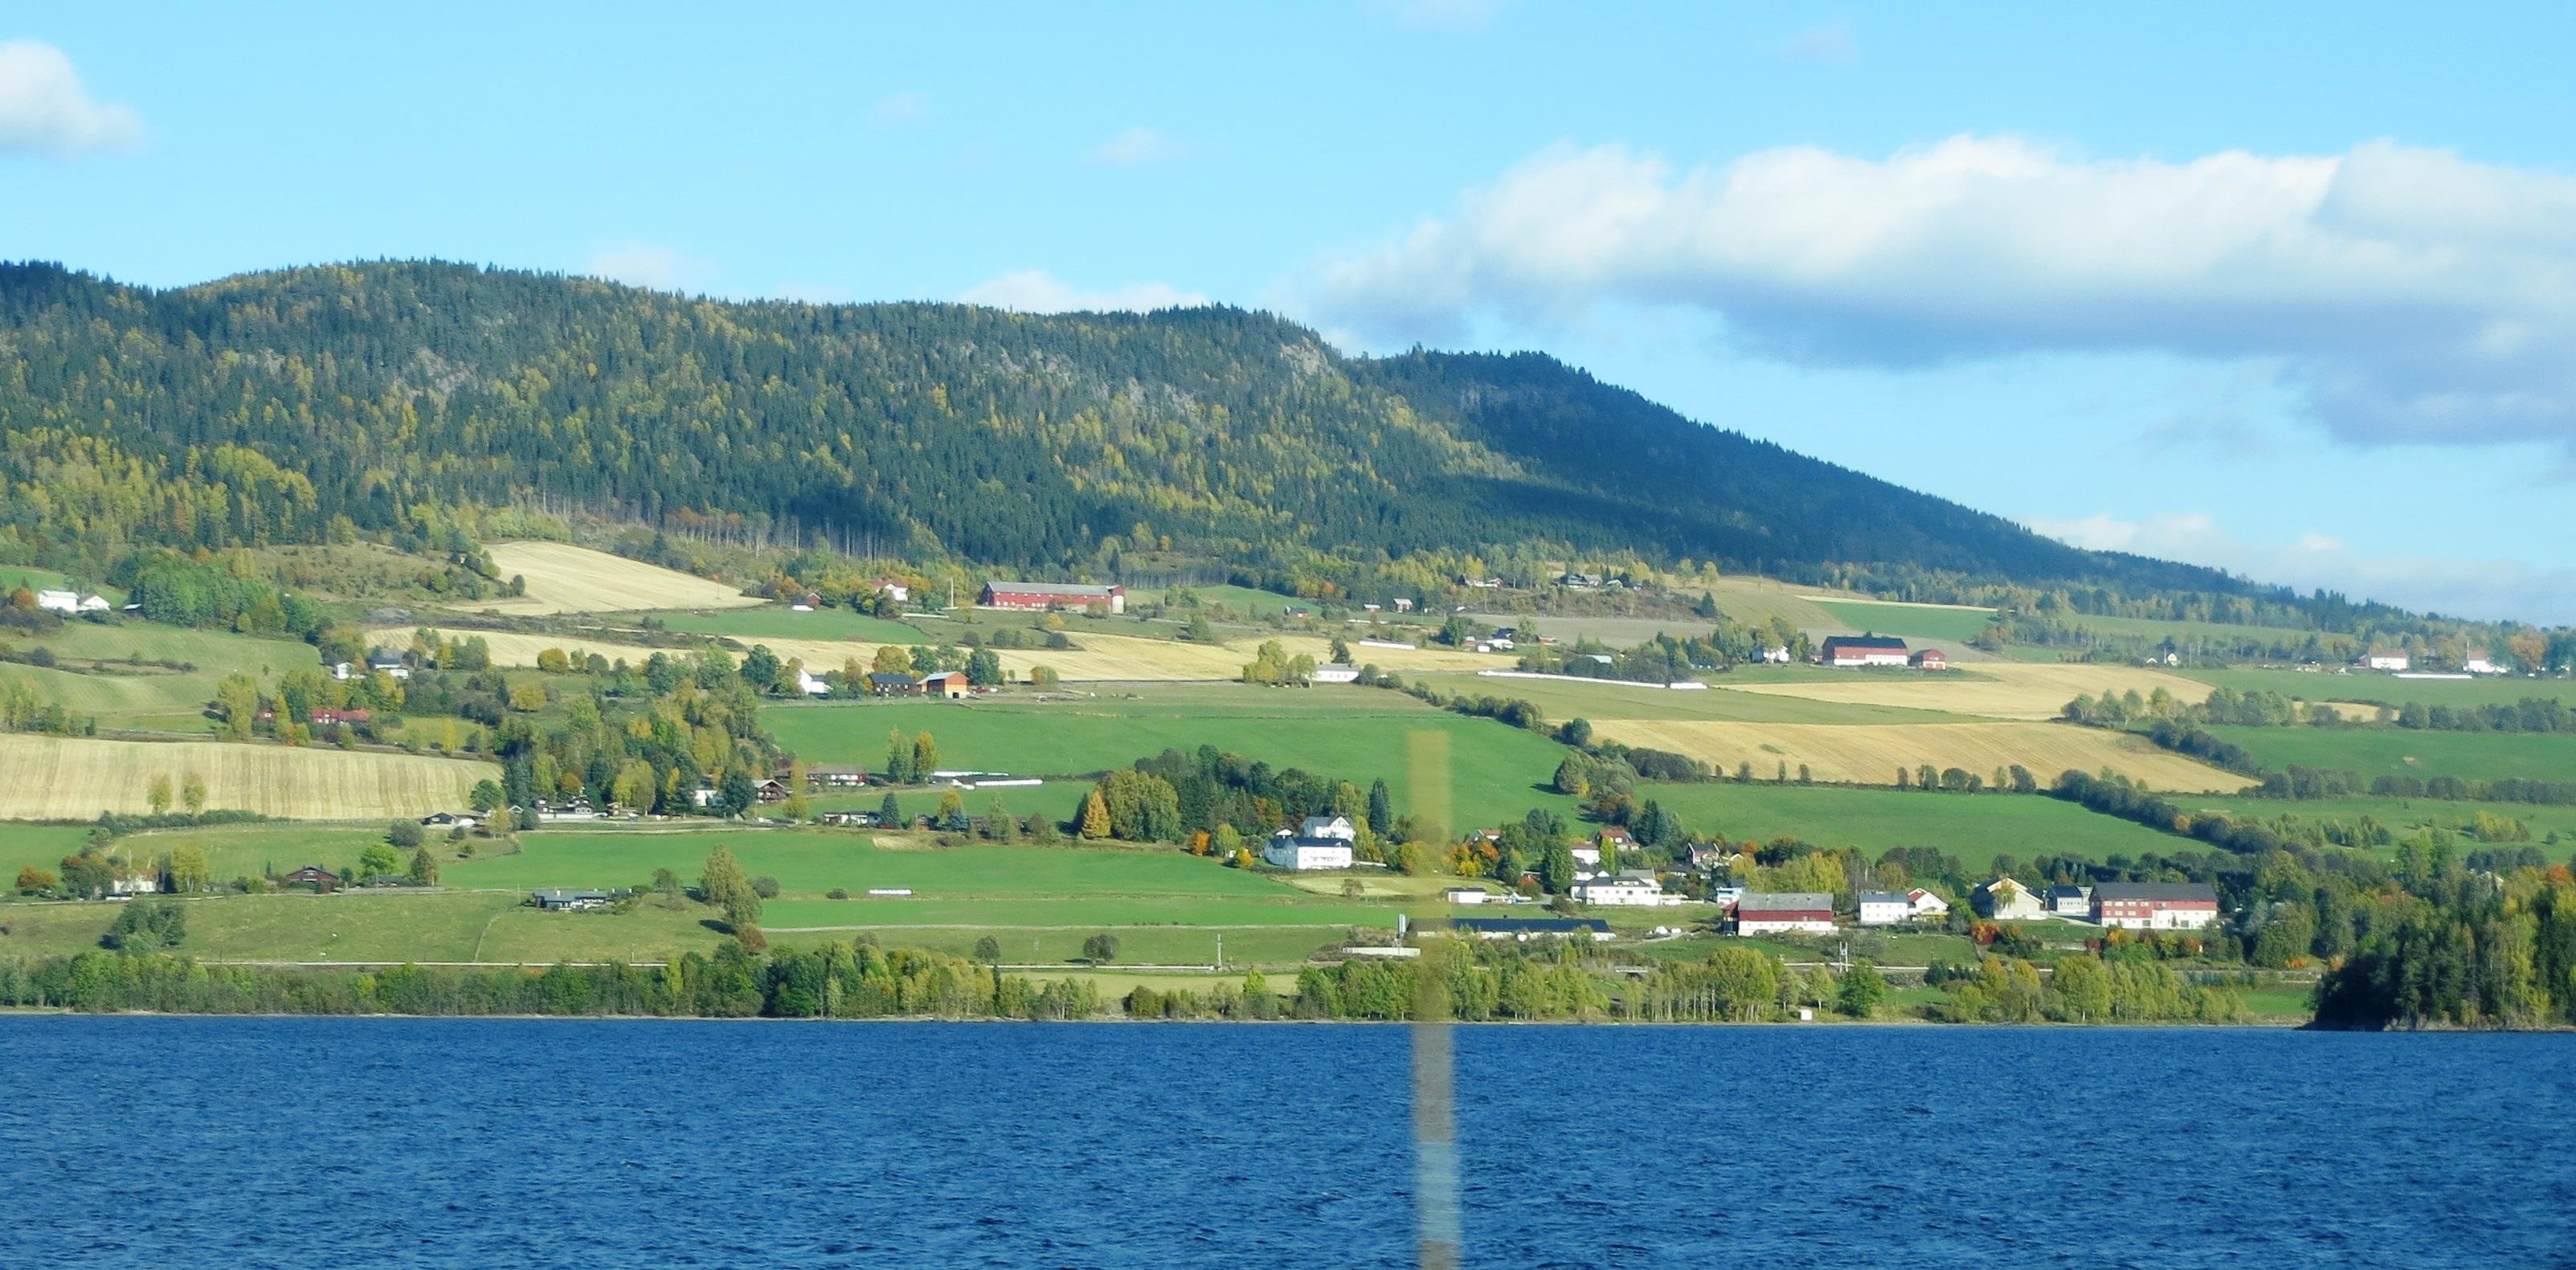 Fil:View over Etnedal and Bruflat, Valdres, Norway.jpg